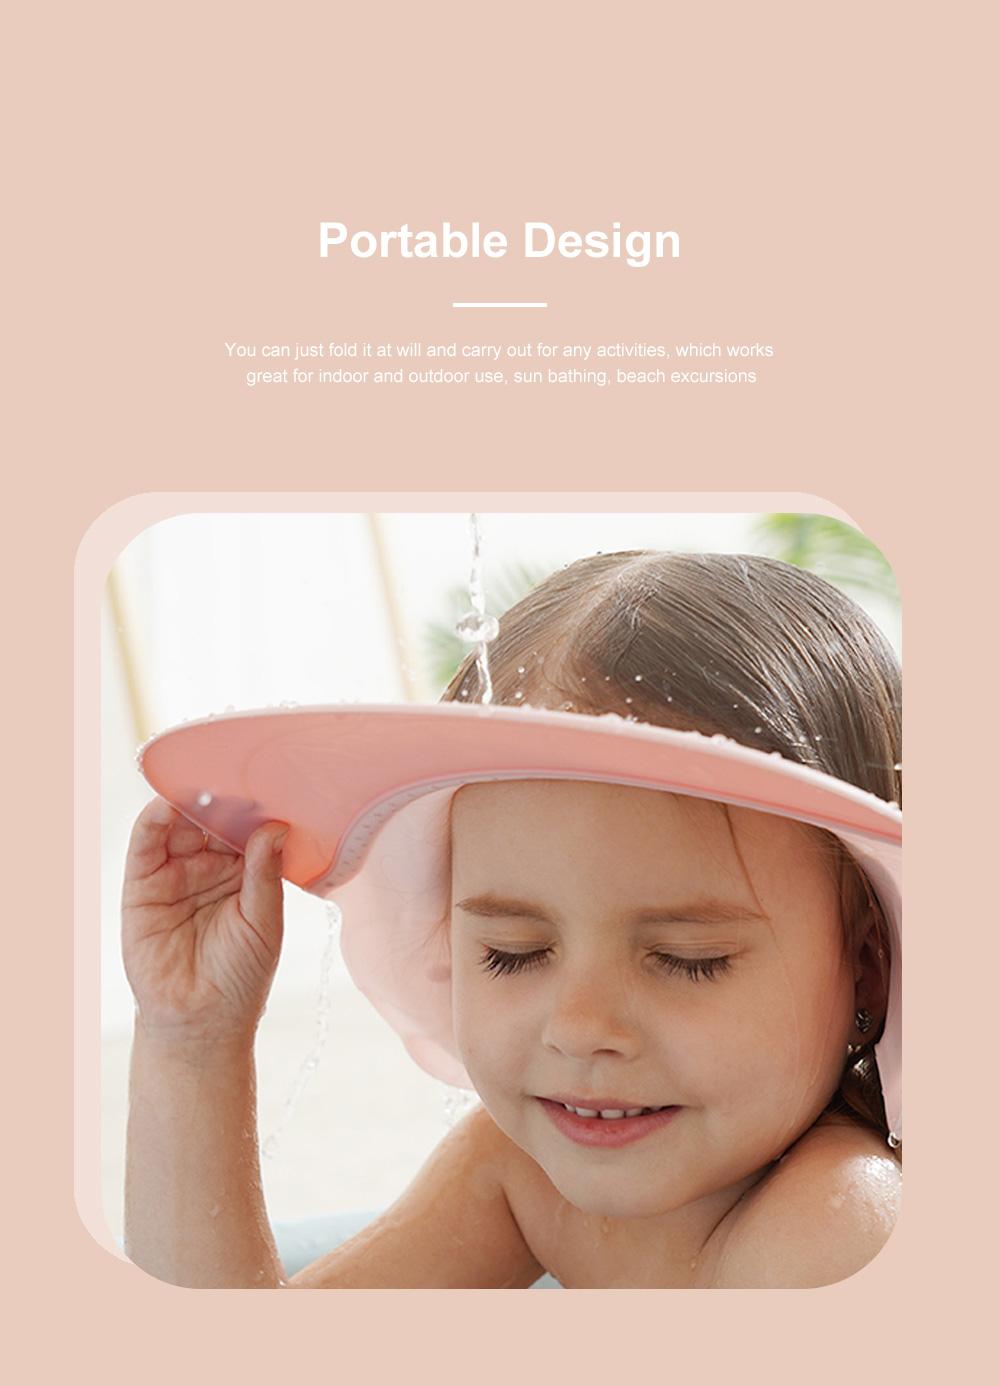 Baby Bathing Cap Shampoo Visor Bathroom Safety Caps with Adjustable Sticker Waterproof & Elastic Octopus Shampoo Hat for Showers, Bathing 2